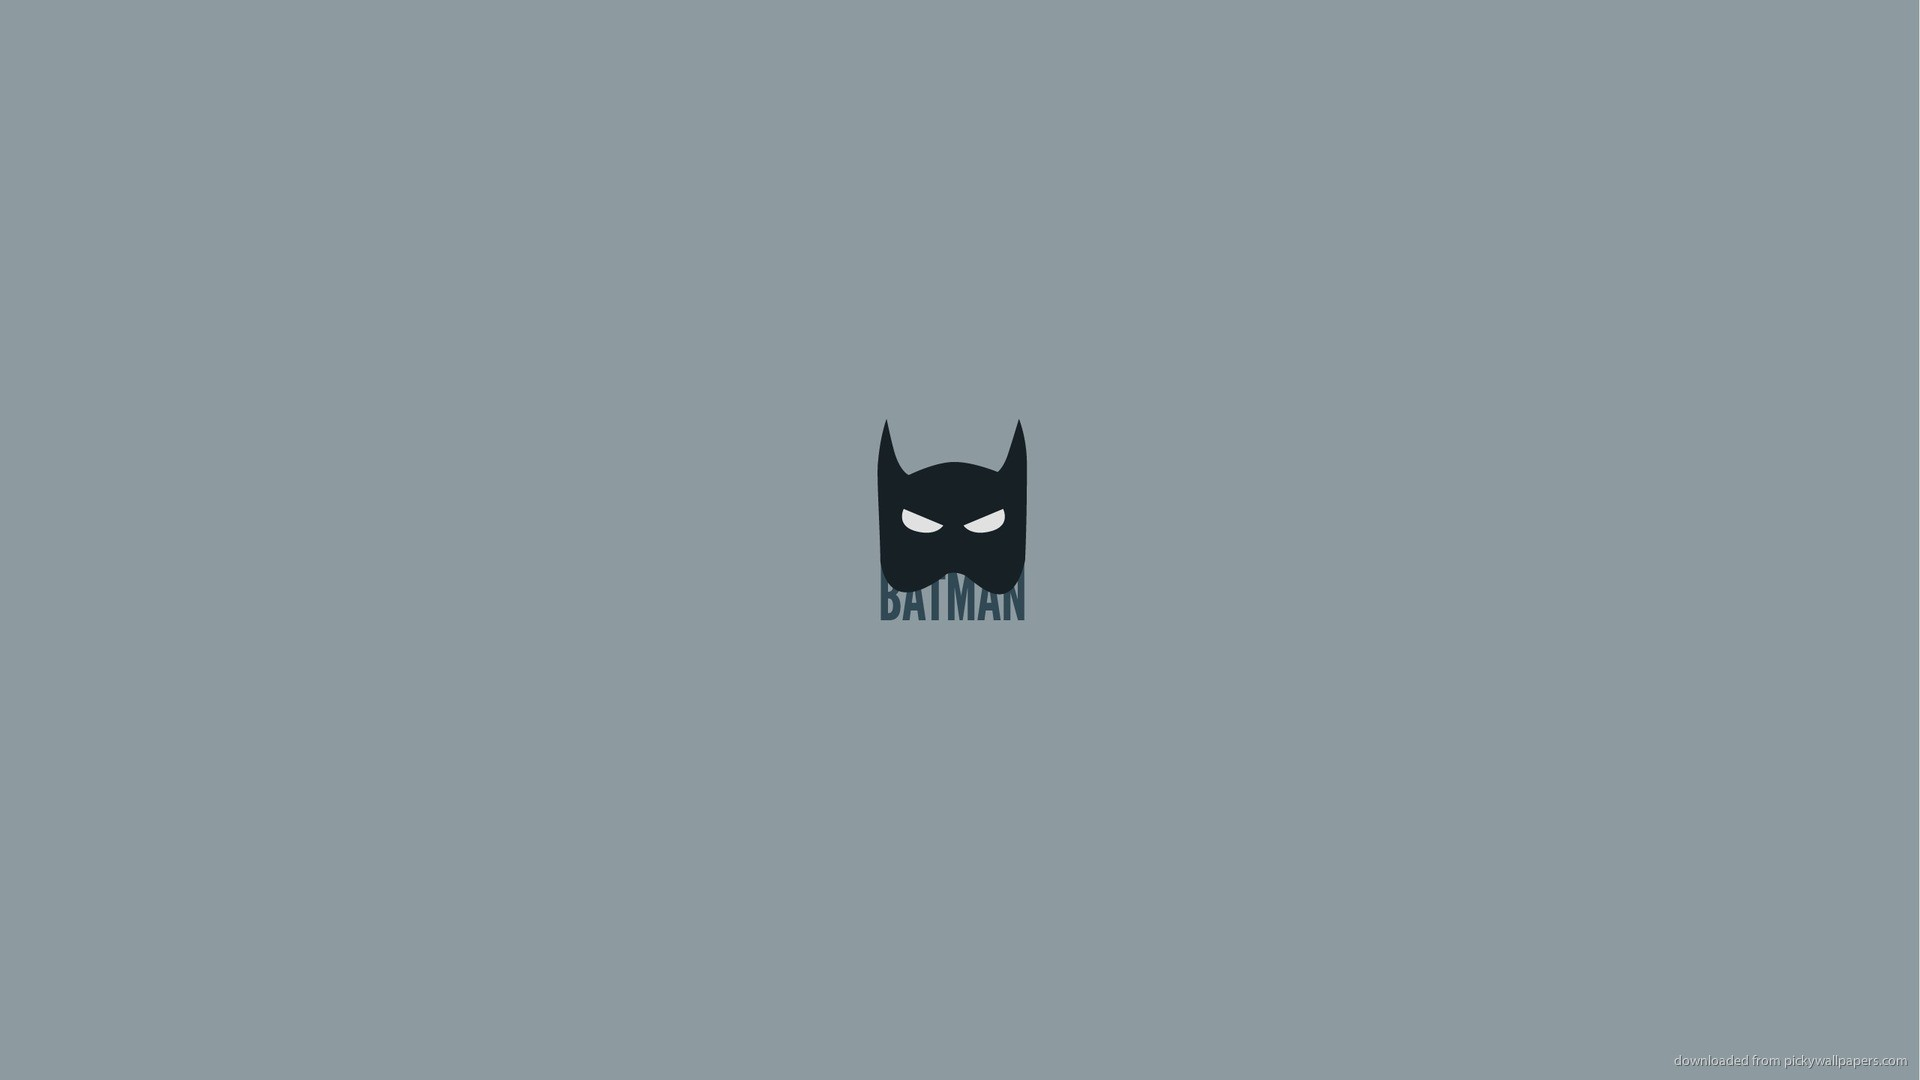 Minimal Batman picture